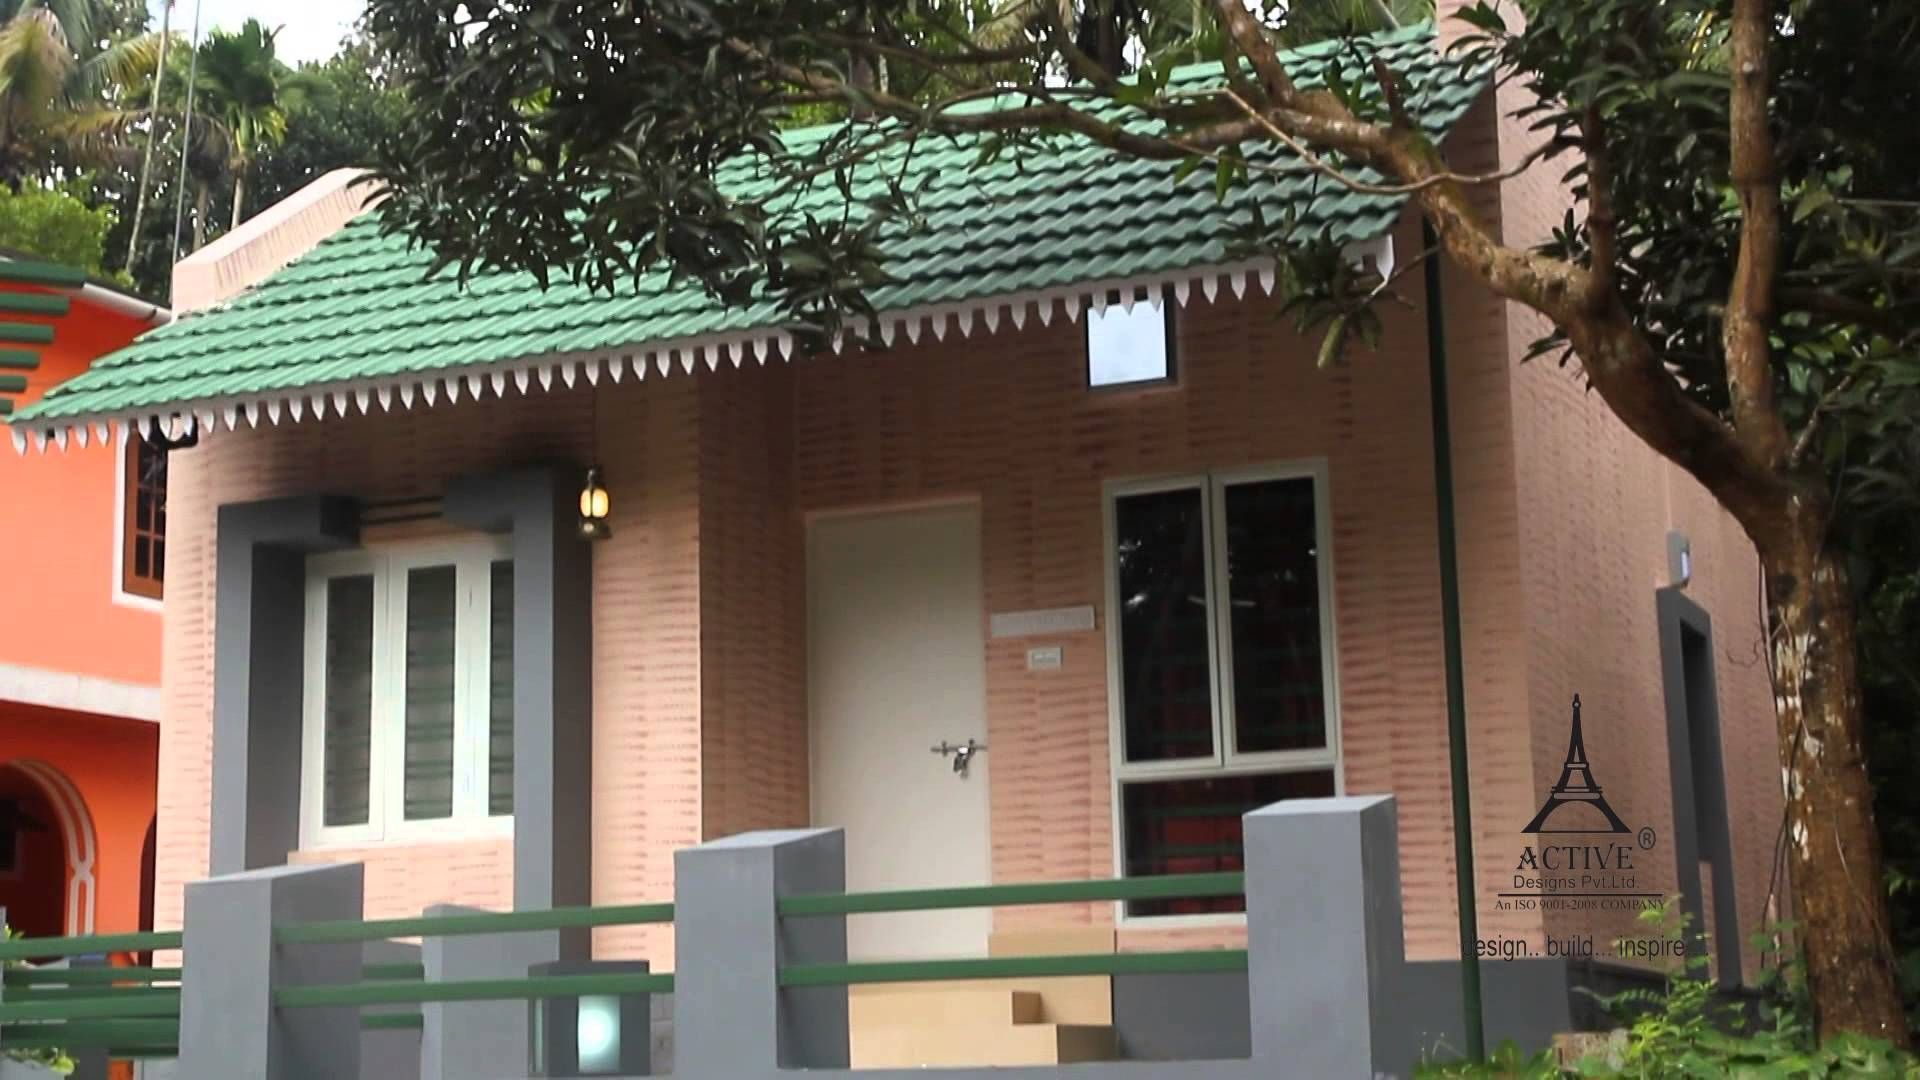 interlocking bricks house designs kerala | house plans and ideas